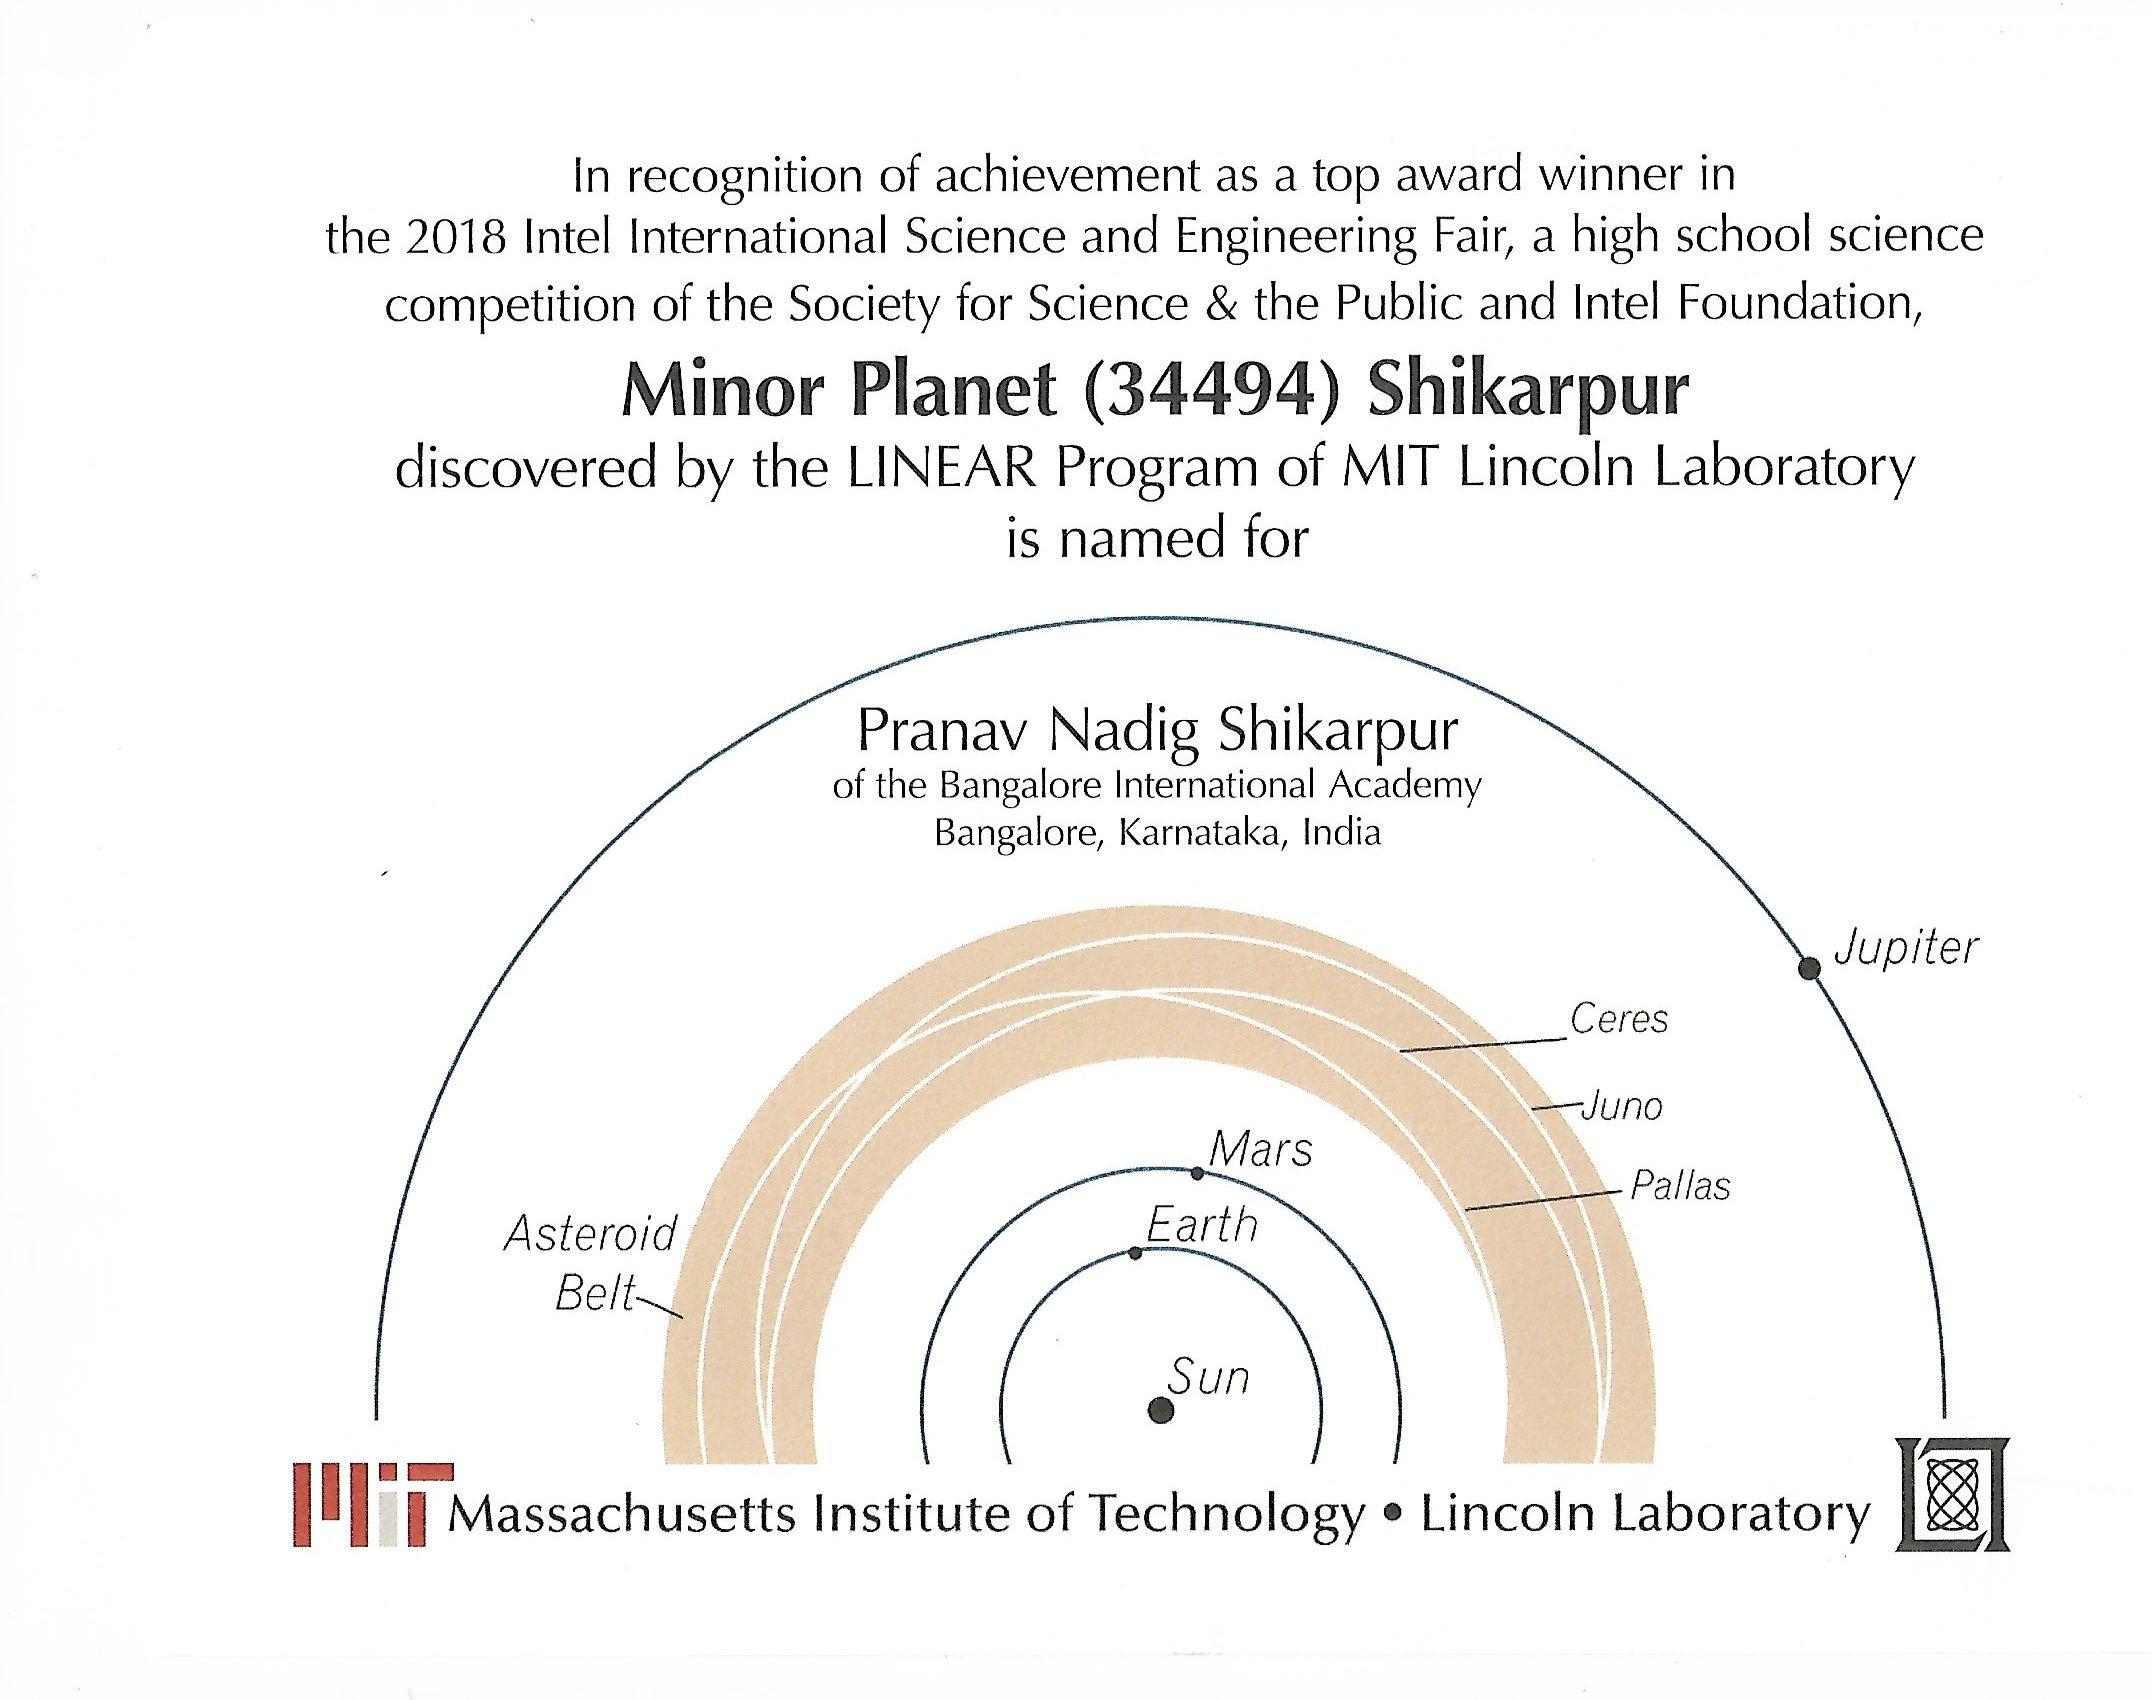 Minor Planet Image